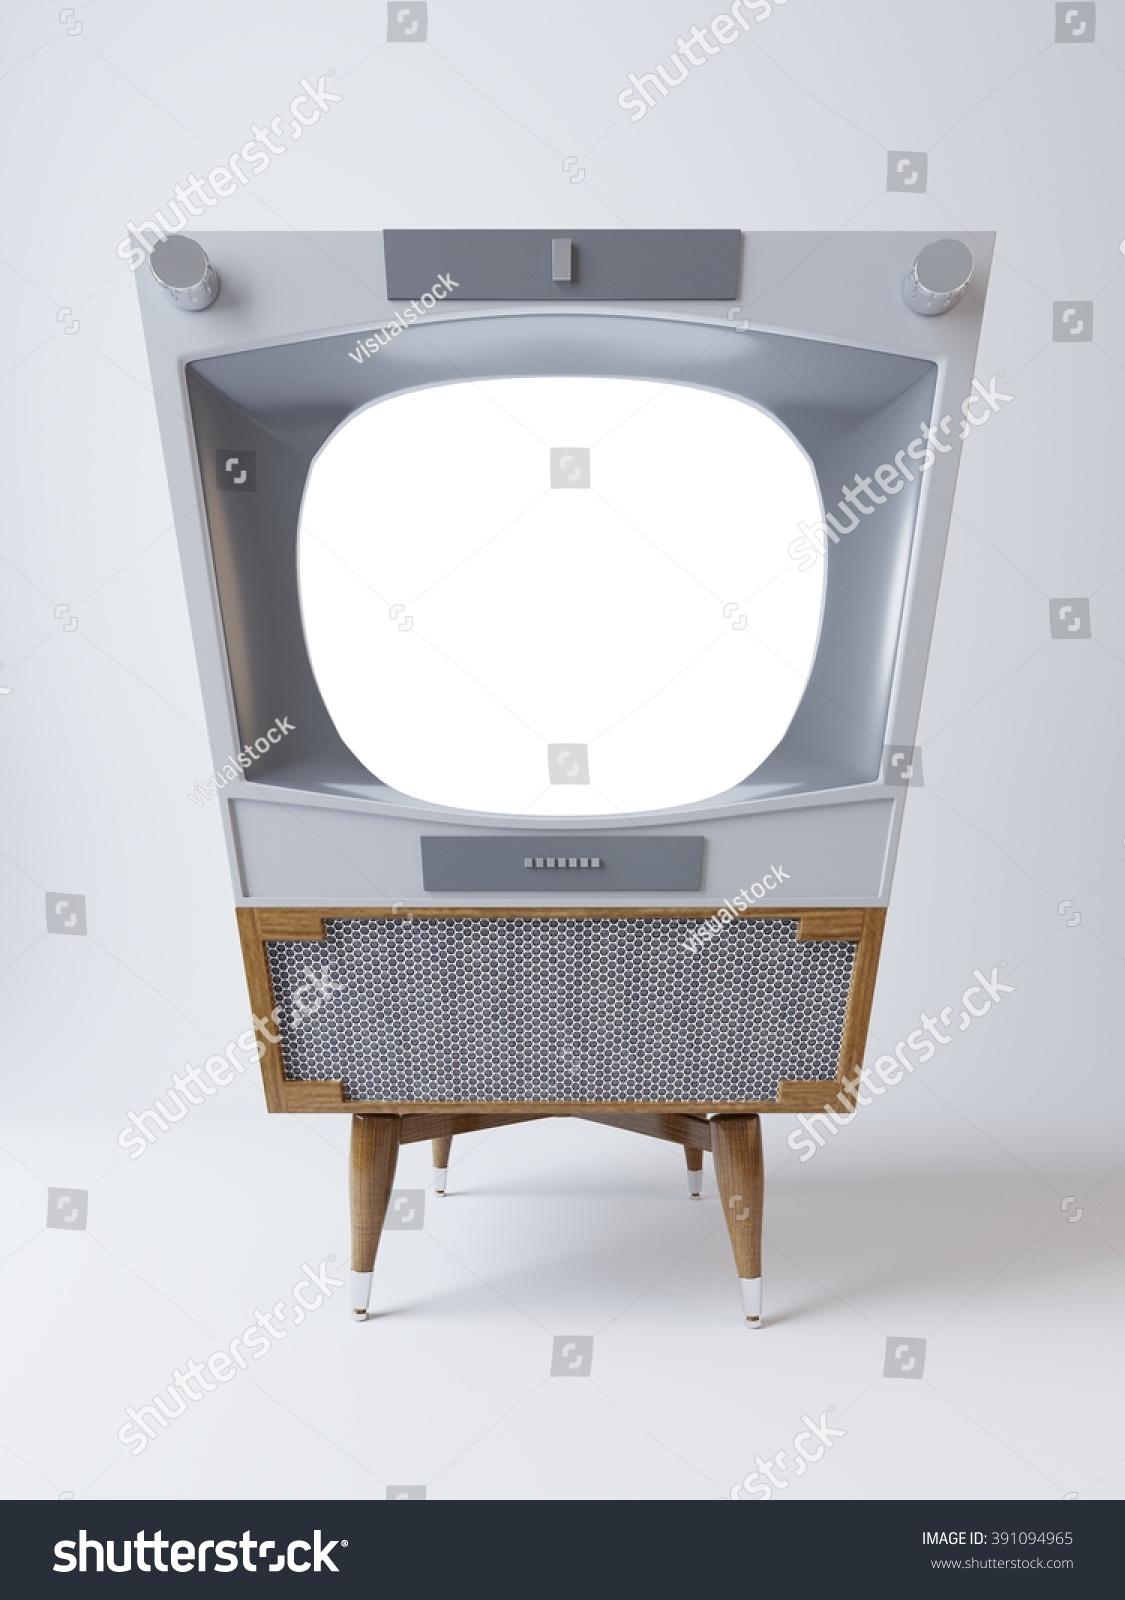 Futuristic Hipster Screen Tv Mockup Aluminum Stock Illustration  # Meuble Tv Ypster